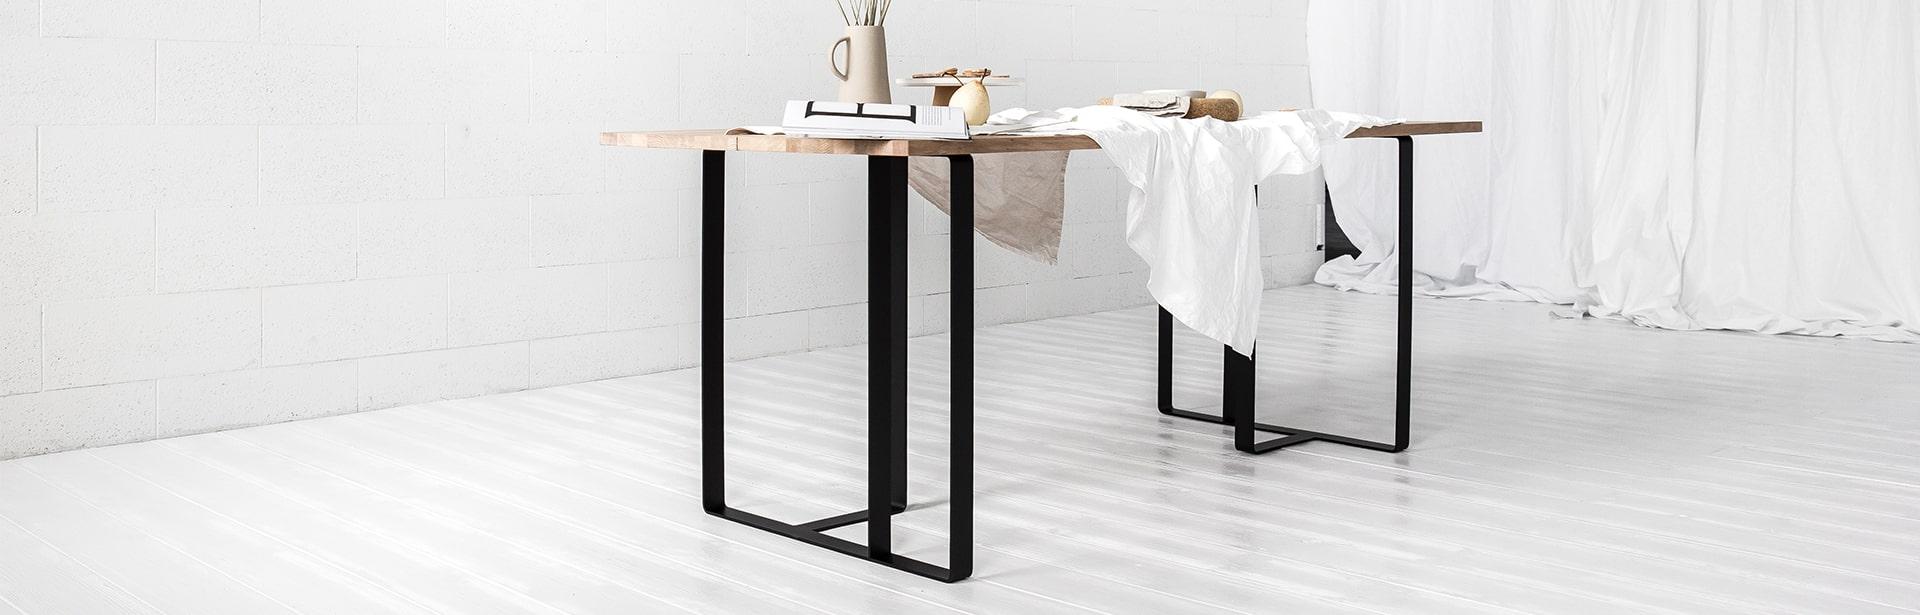 Modernūs baldai